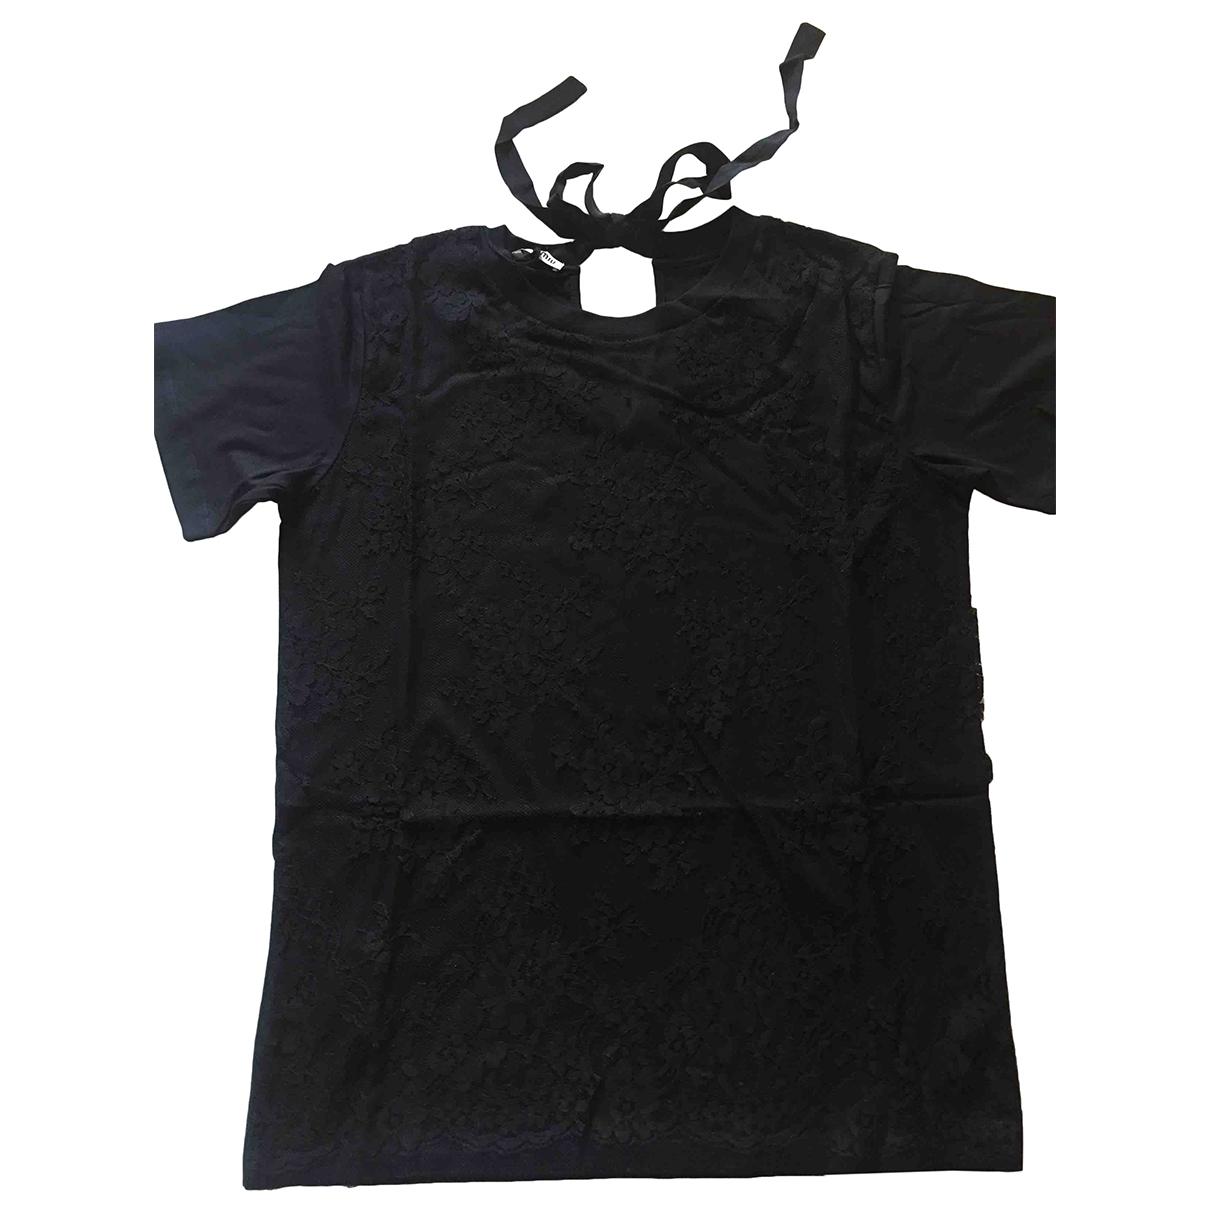 Miu Miu \N Black Cotton  top for Women M International